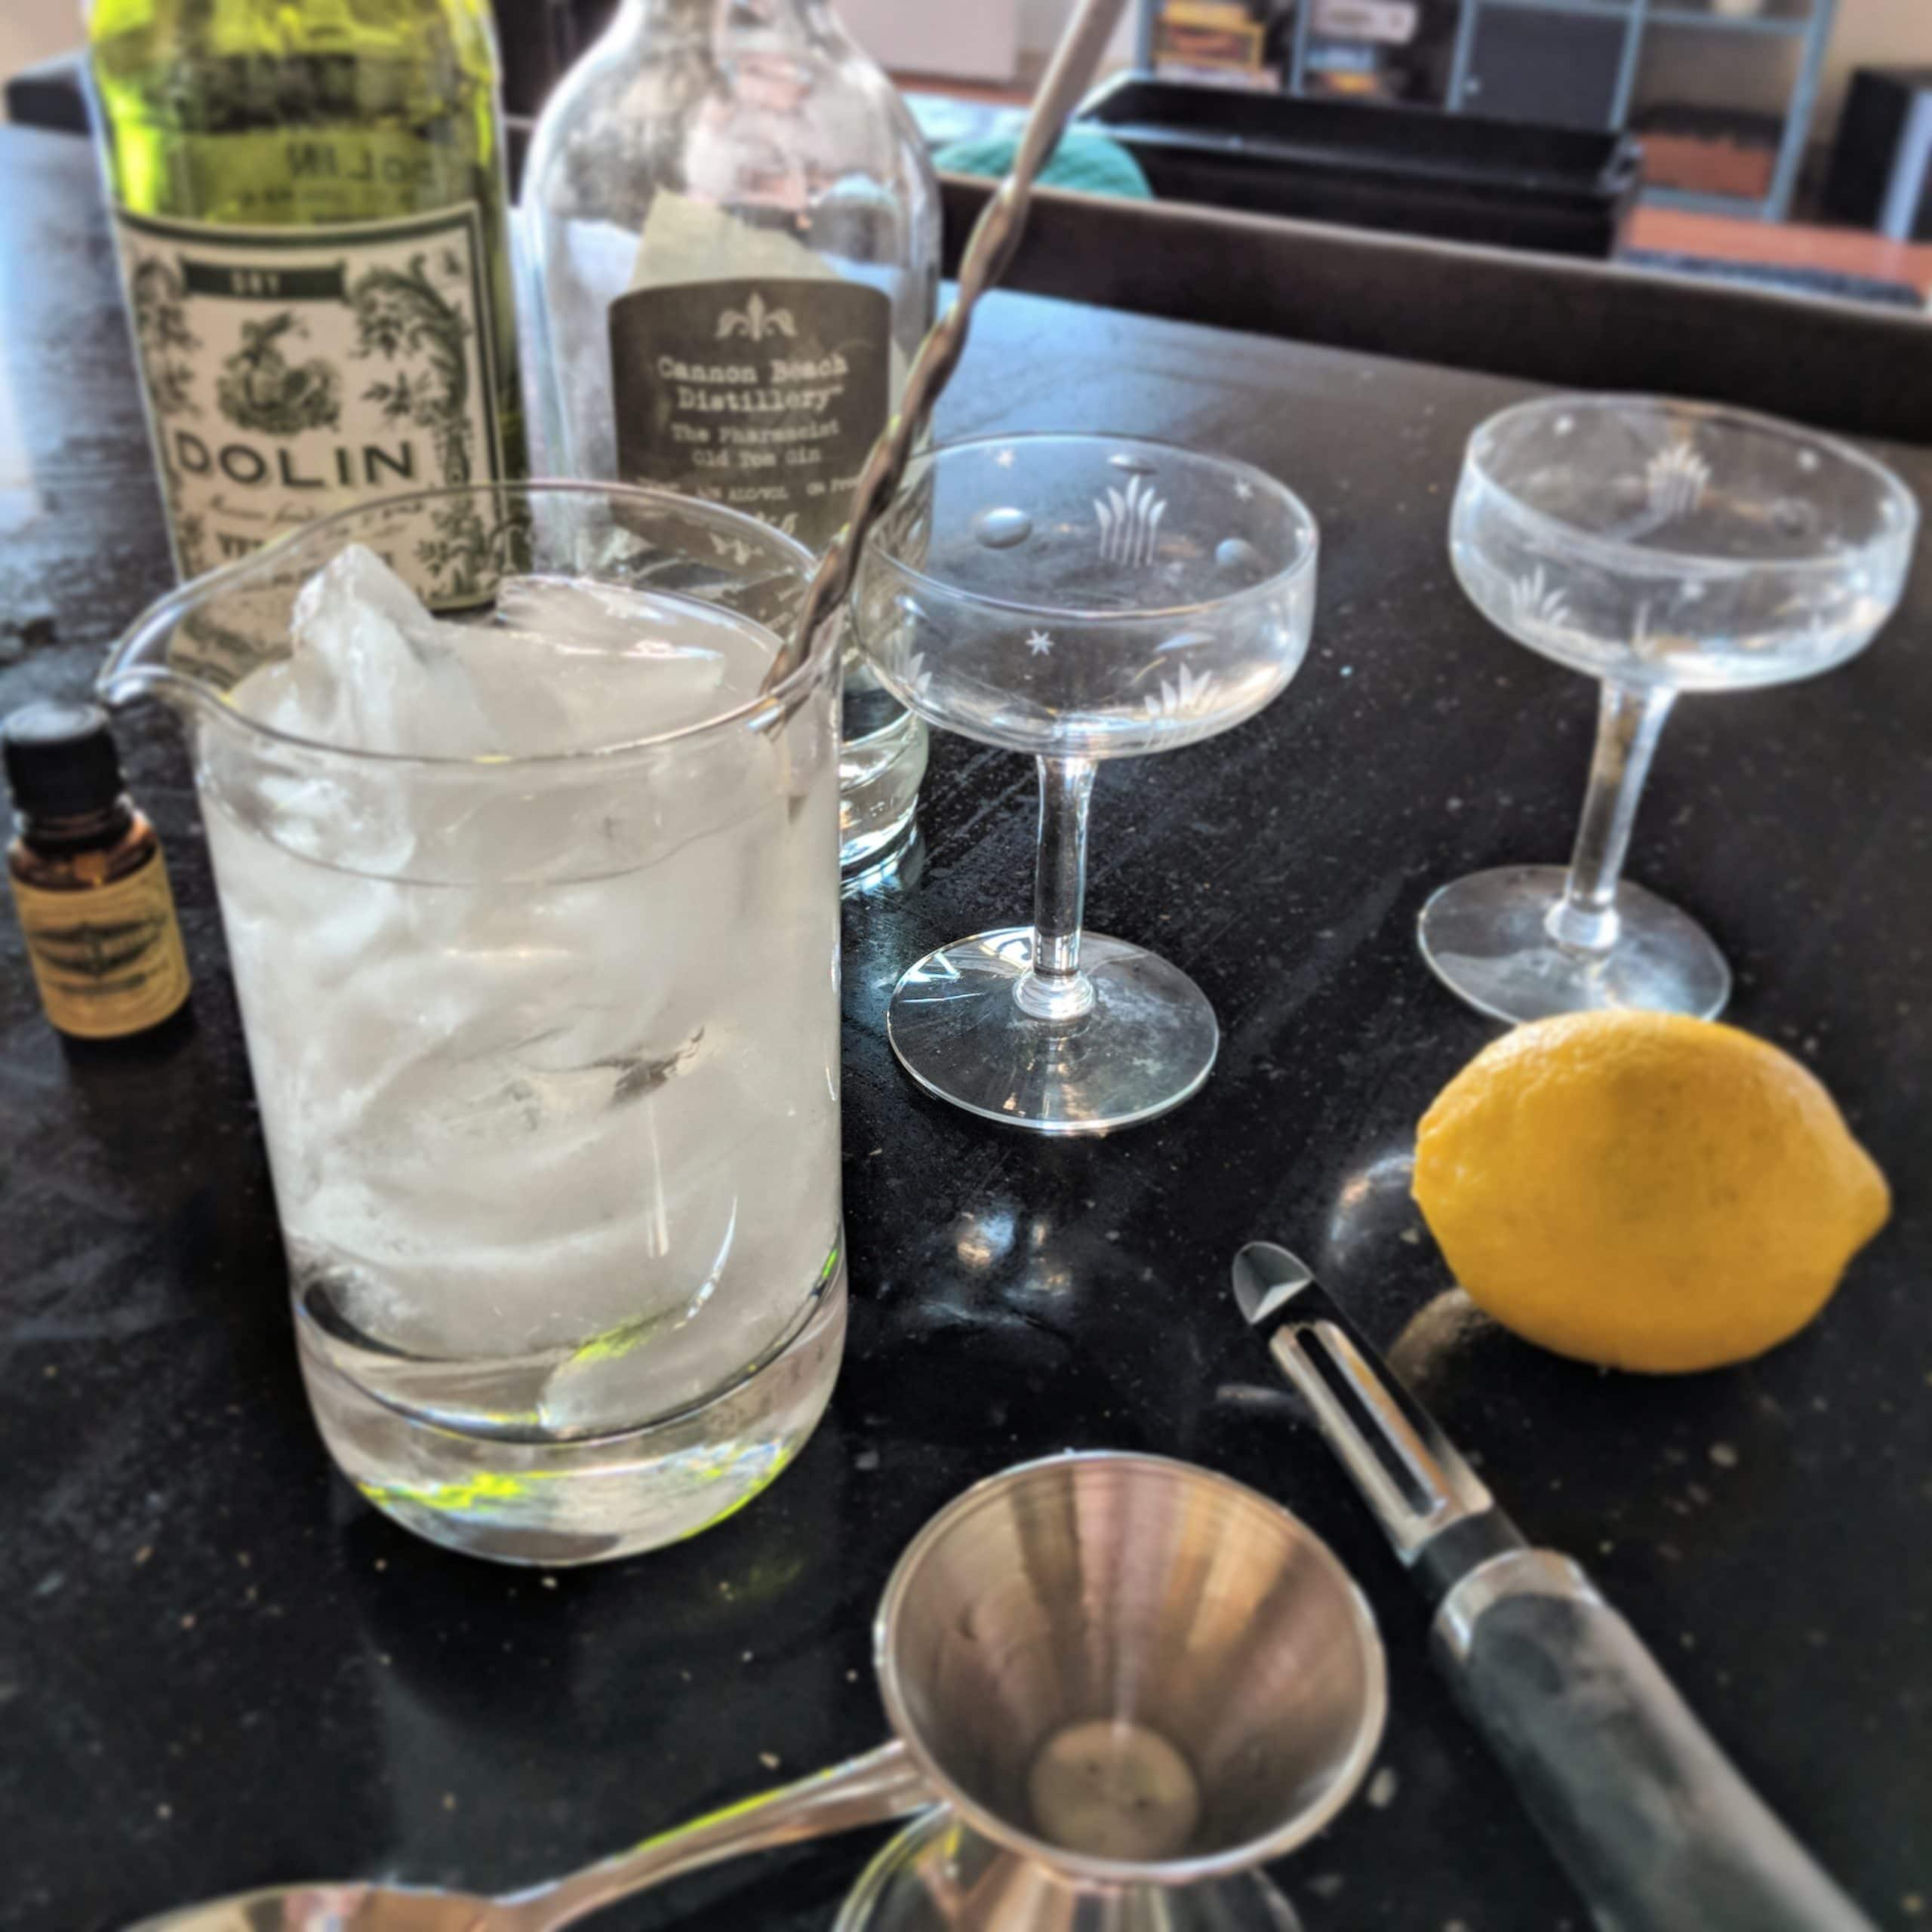 Aaron's Martini #1